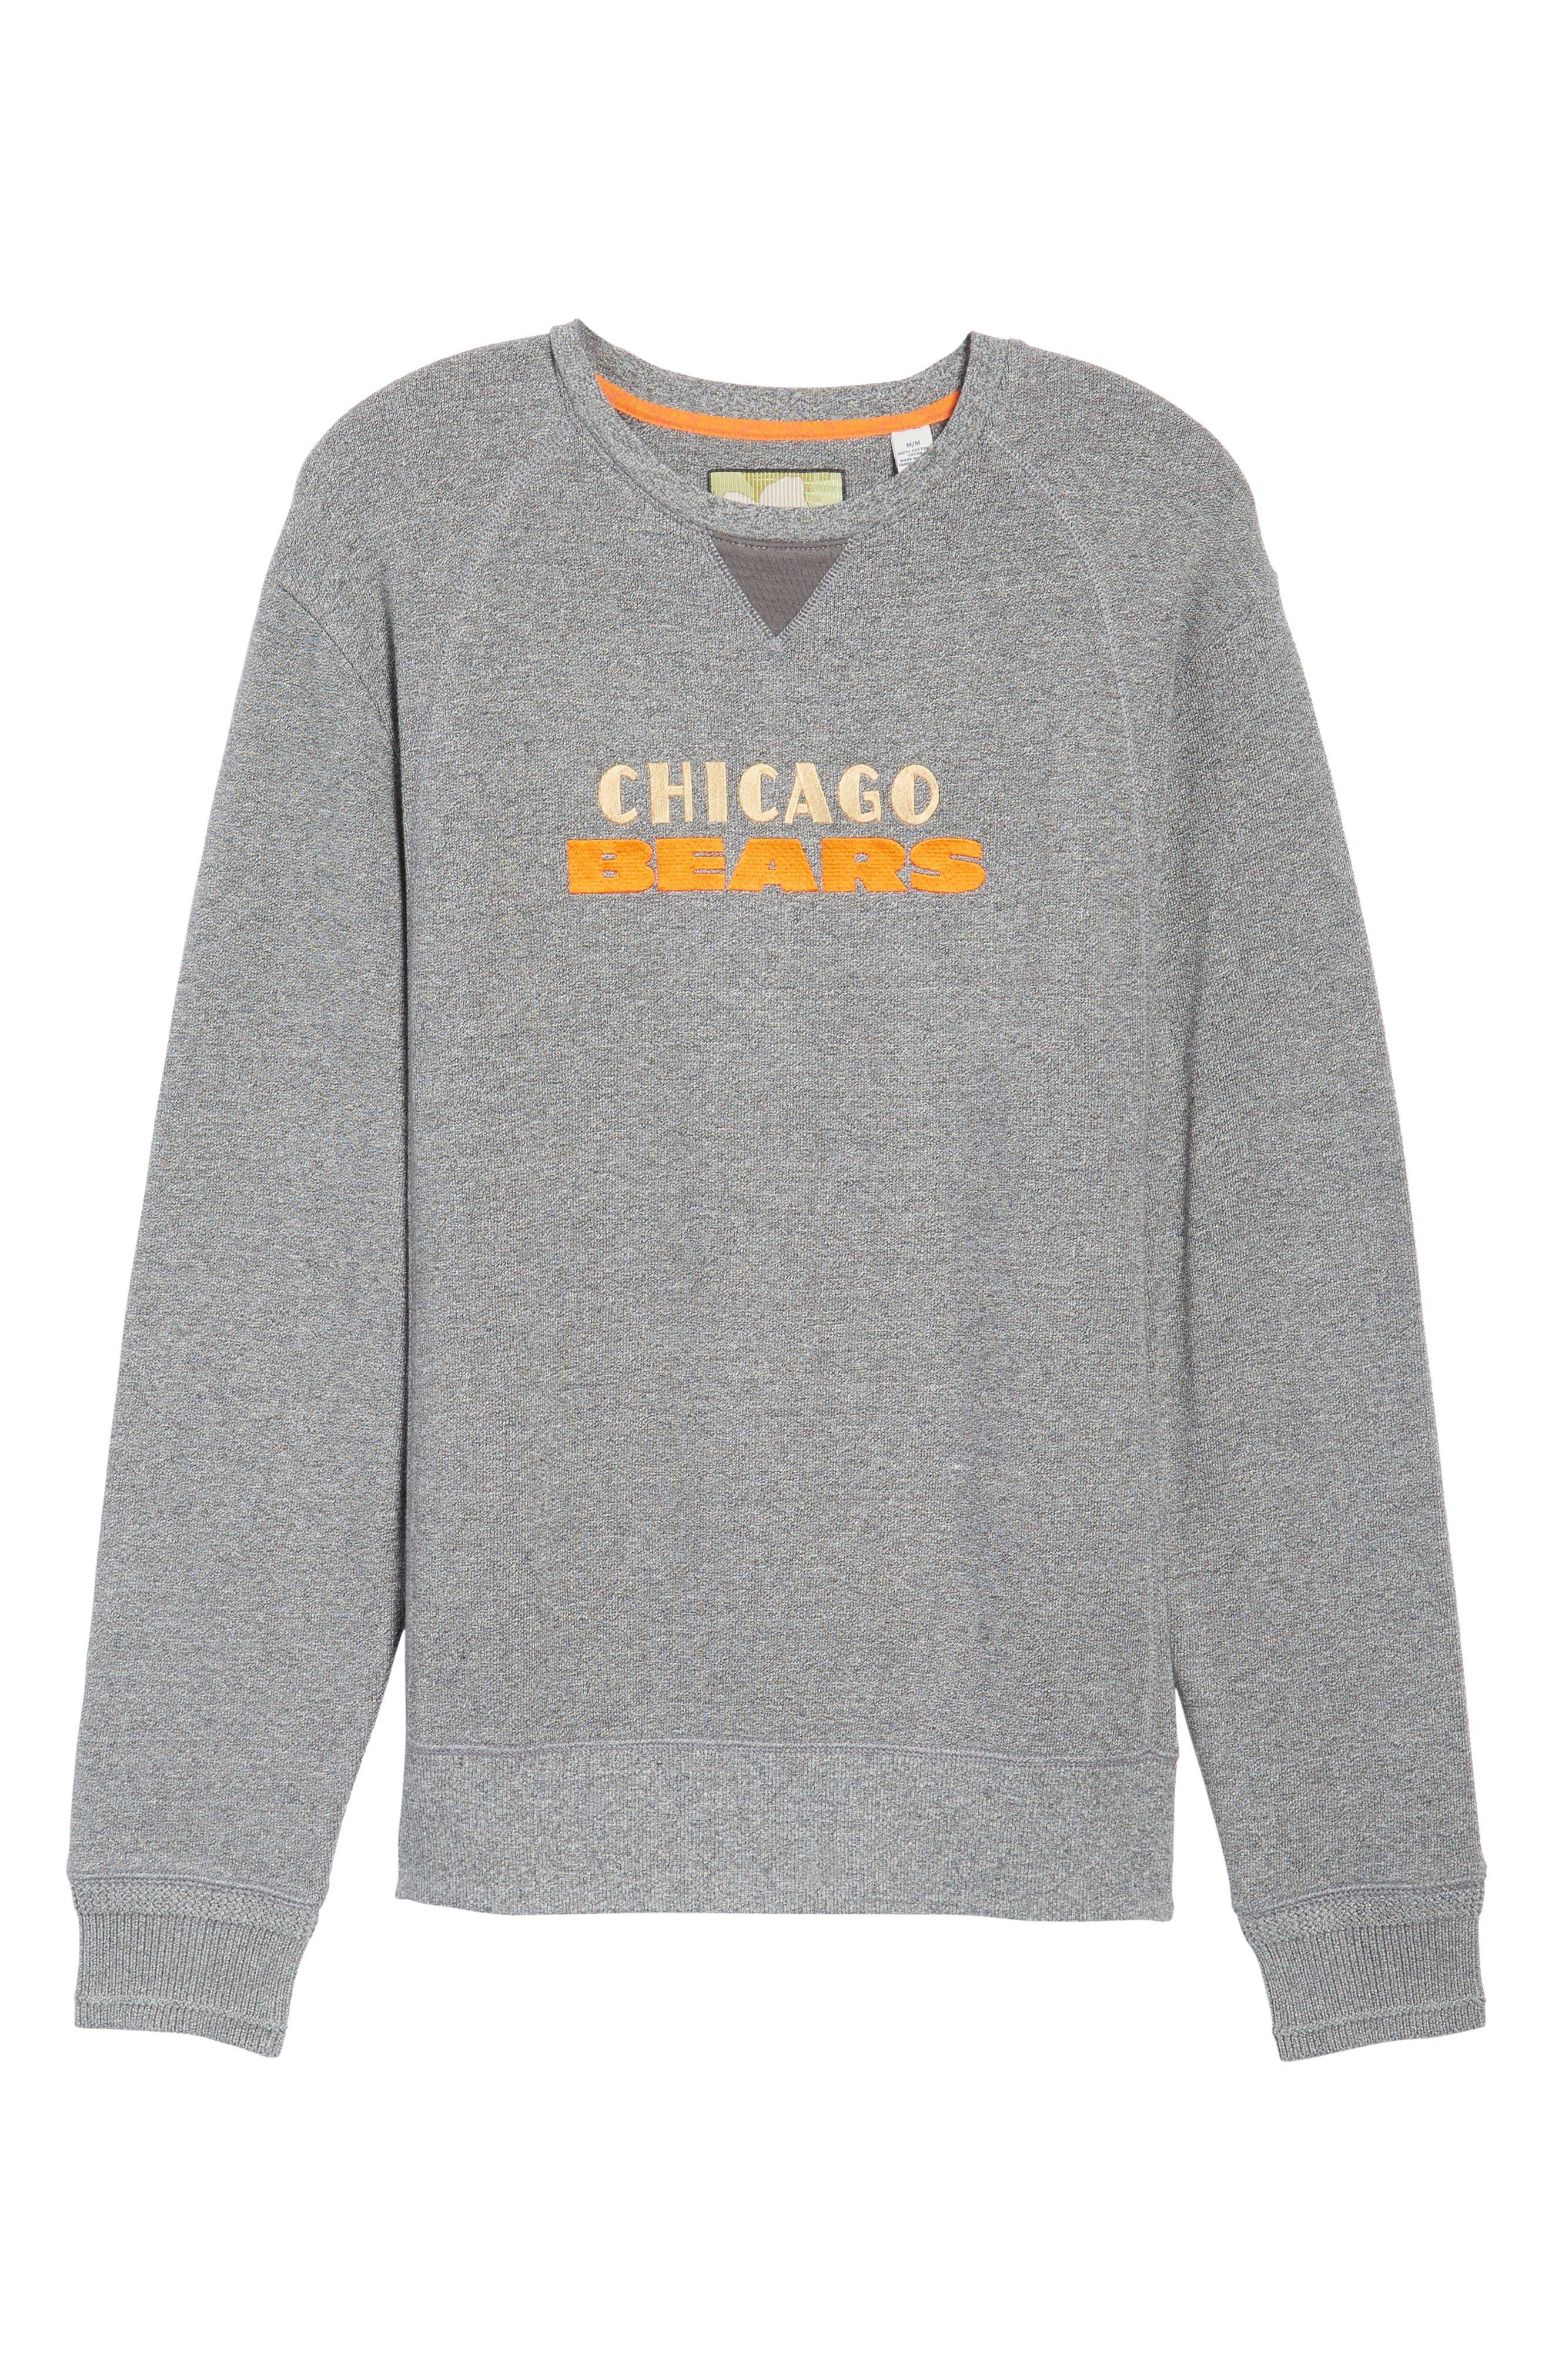 NFL Stitch of Liberty Embroidered Crewneck Sweatshirt,                             Alternate thumbnail 155, color,